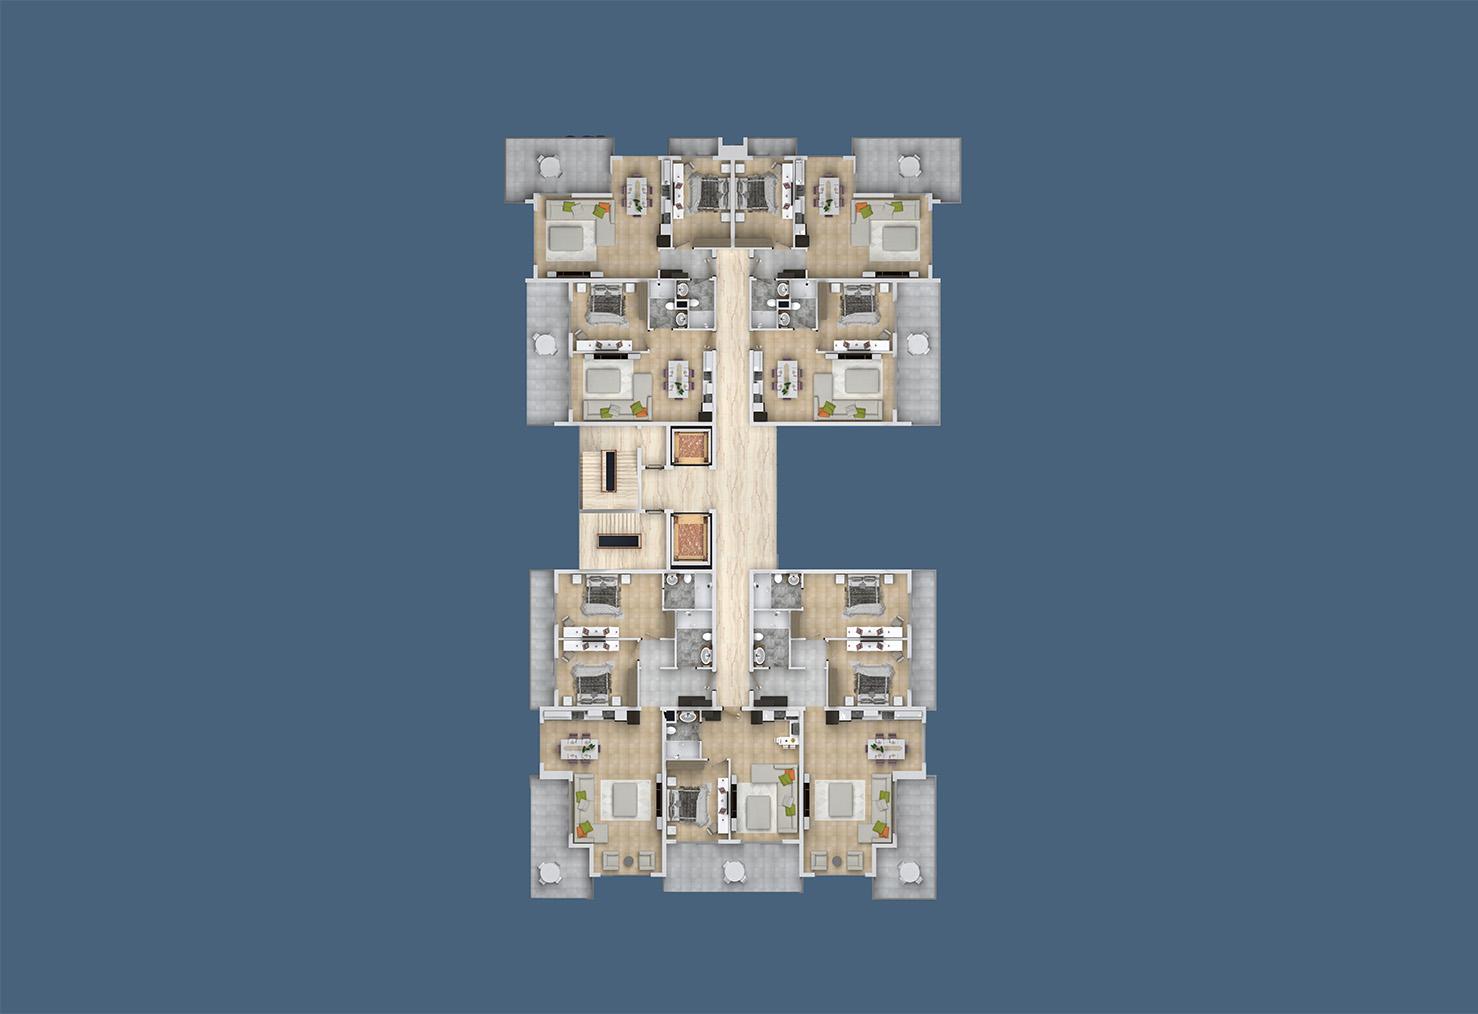 Floor plans of apartments 3 floor «D» Yekta Kingdom Trade Center